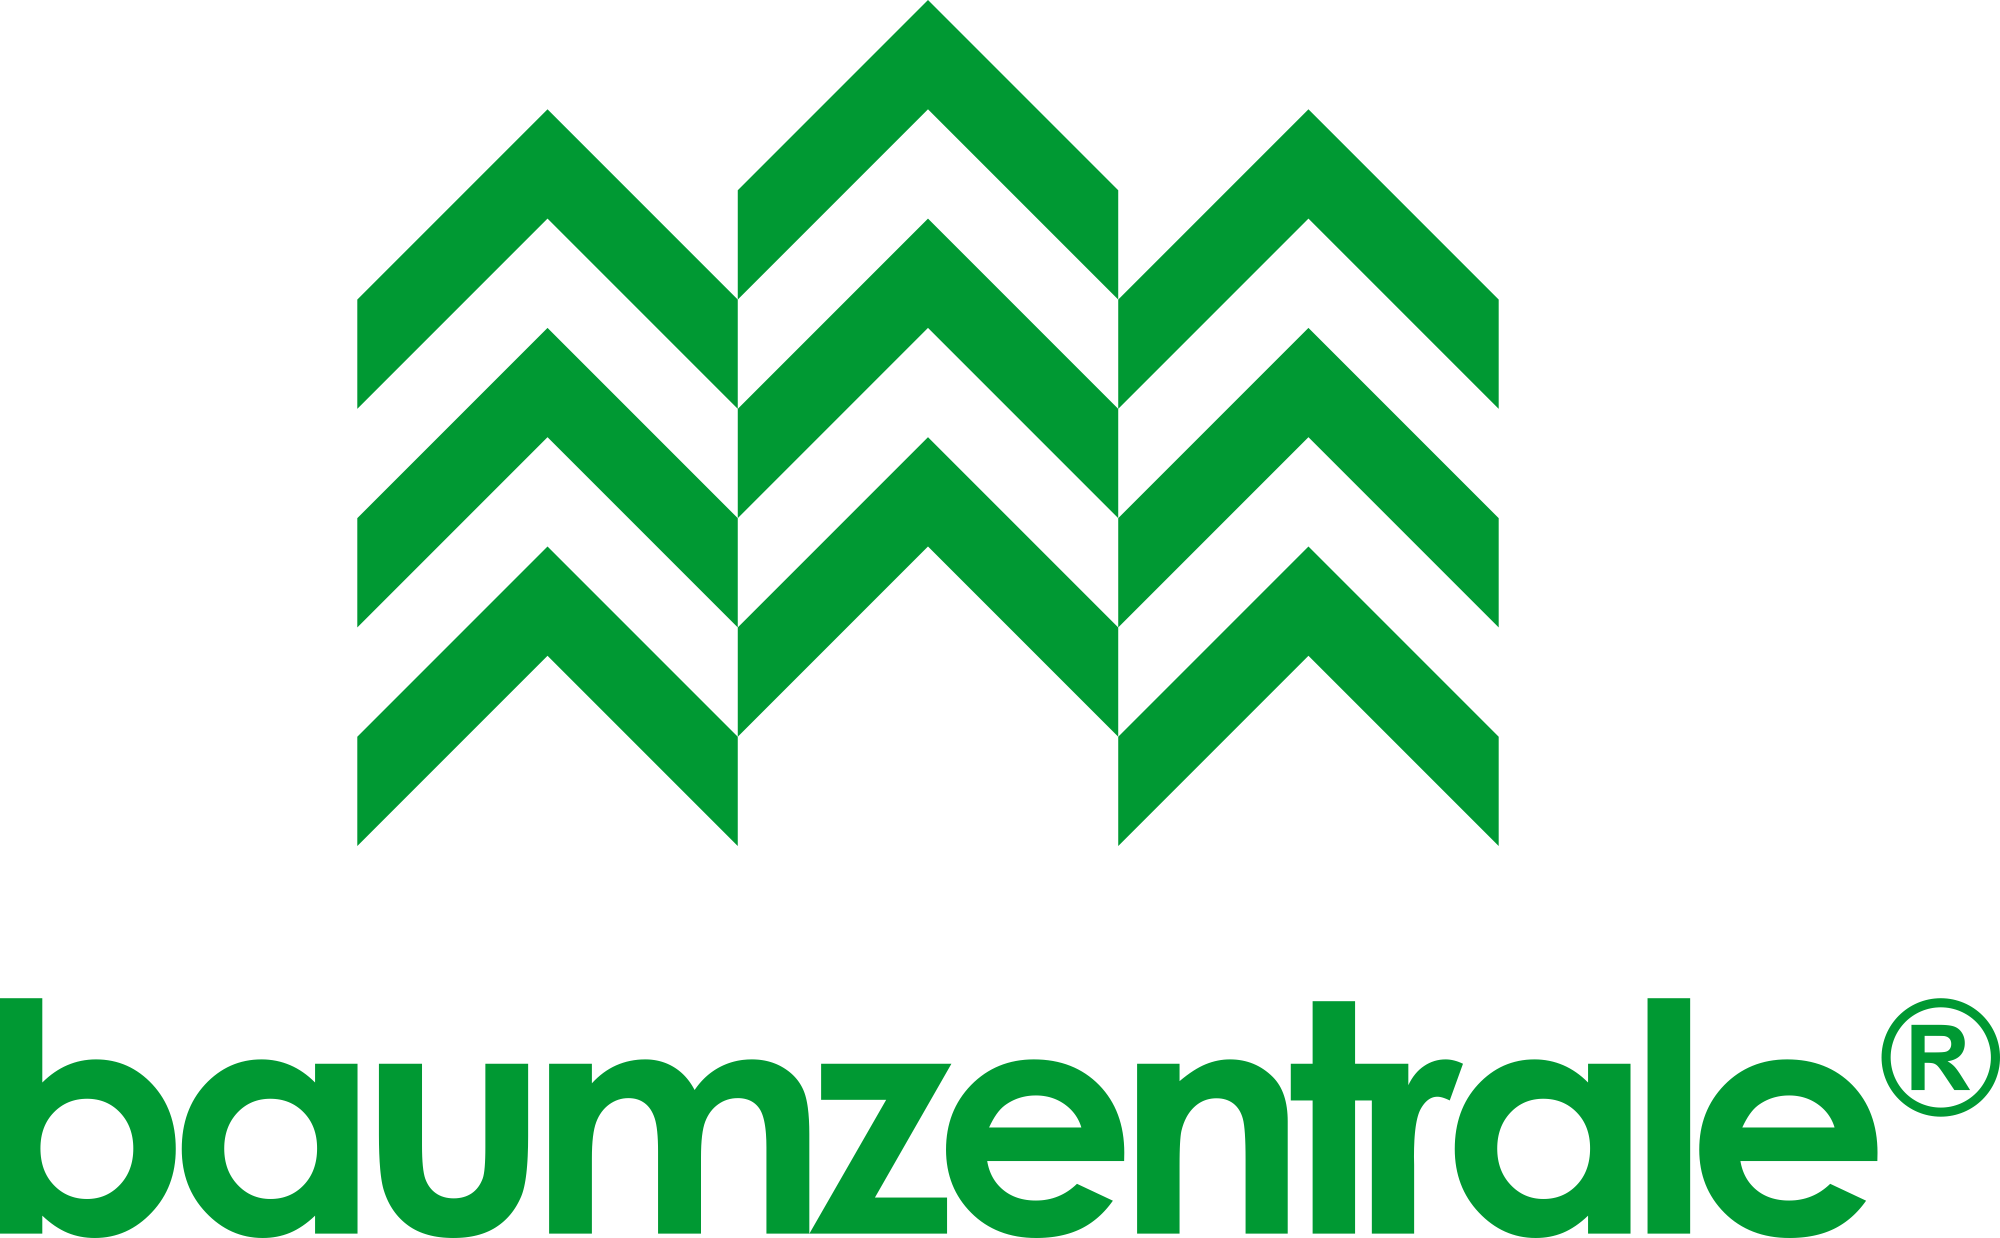 create a awesome emblem for a climbing arborist/tree care company